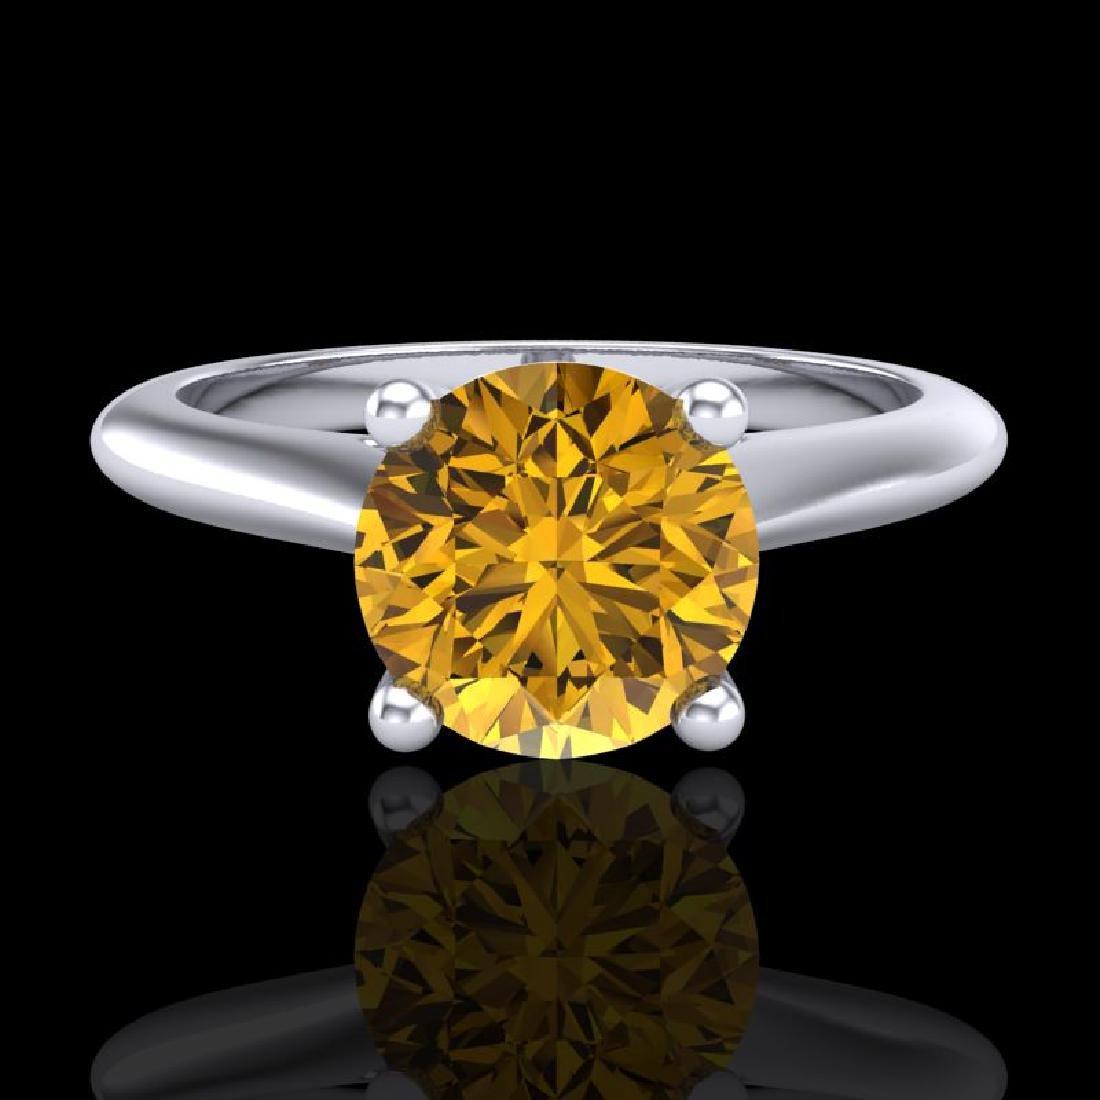 1.36 CTW Intense Fancy Yellow Diamond Engagement Art - 2